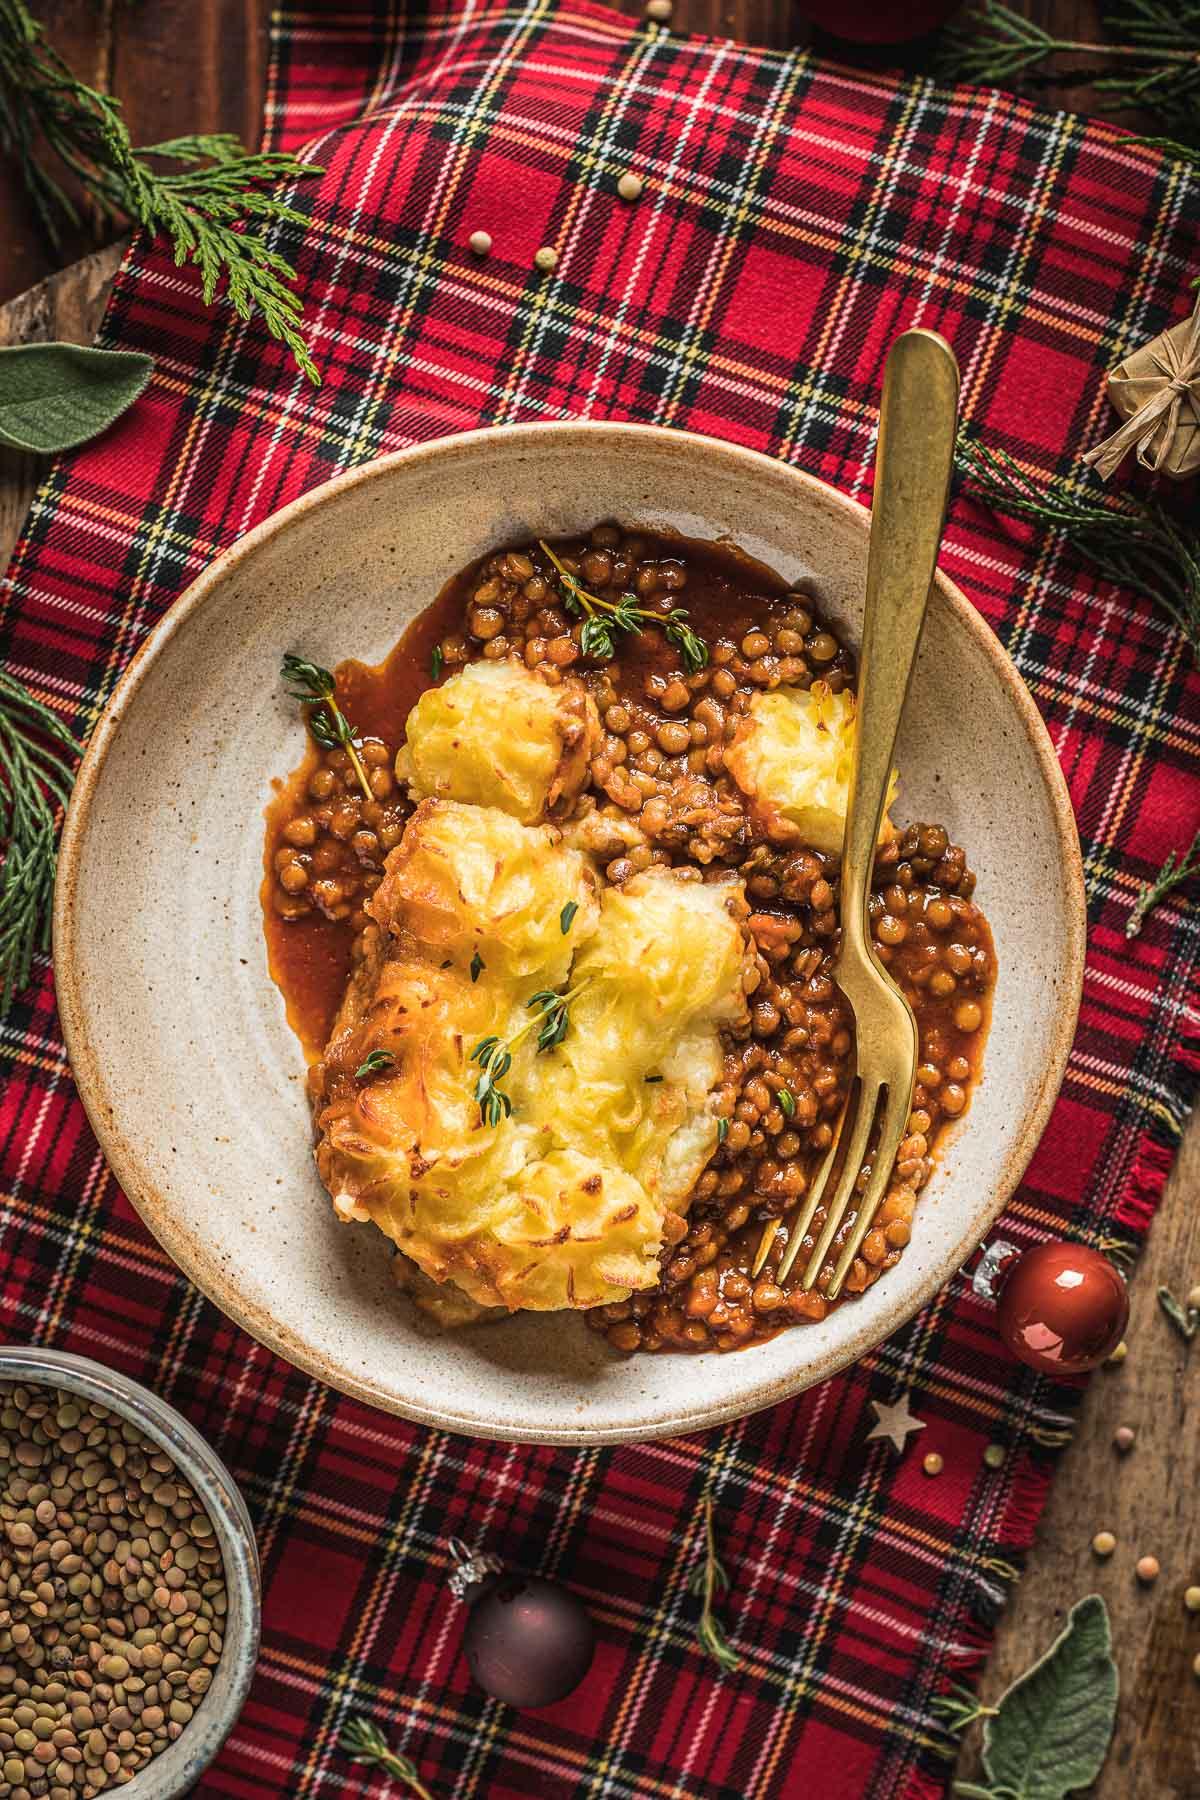 healthy Vegan Shepherd's Pie recipe with lentil ragu for Thanksgiving ricetta di Natale Shepherd's Pie vegana di lenticchie con ragù di lenticchie funghi #glutenfree